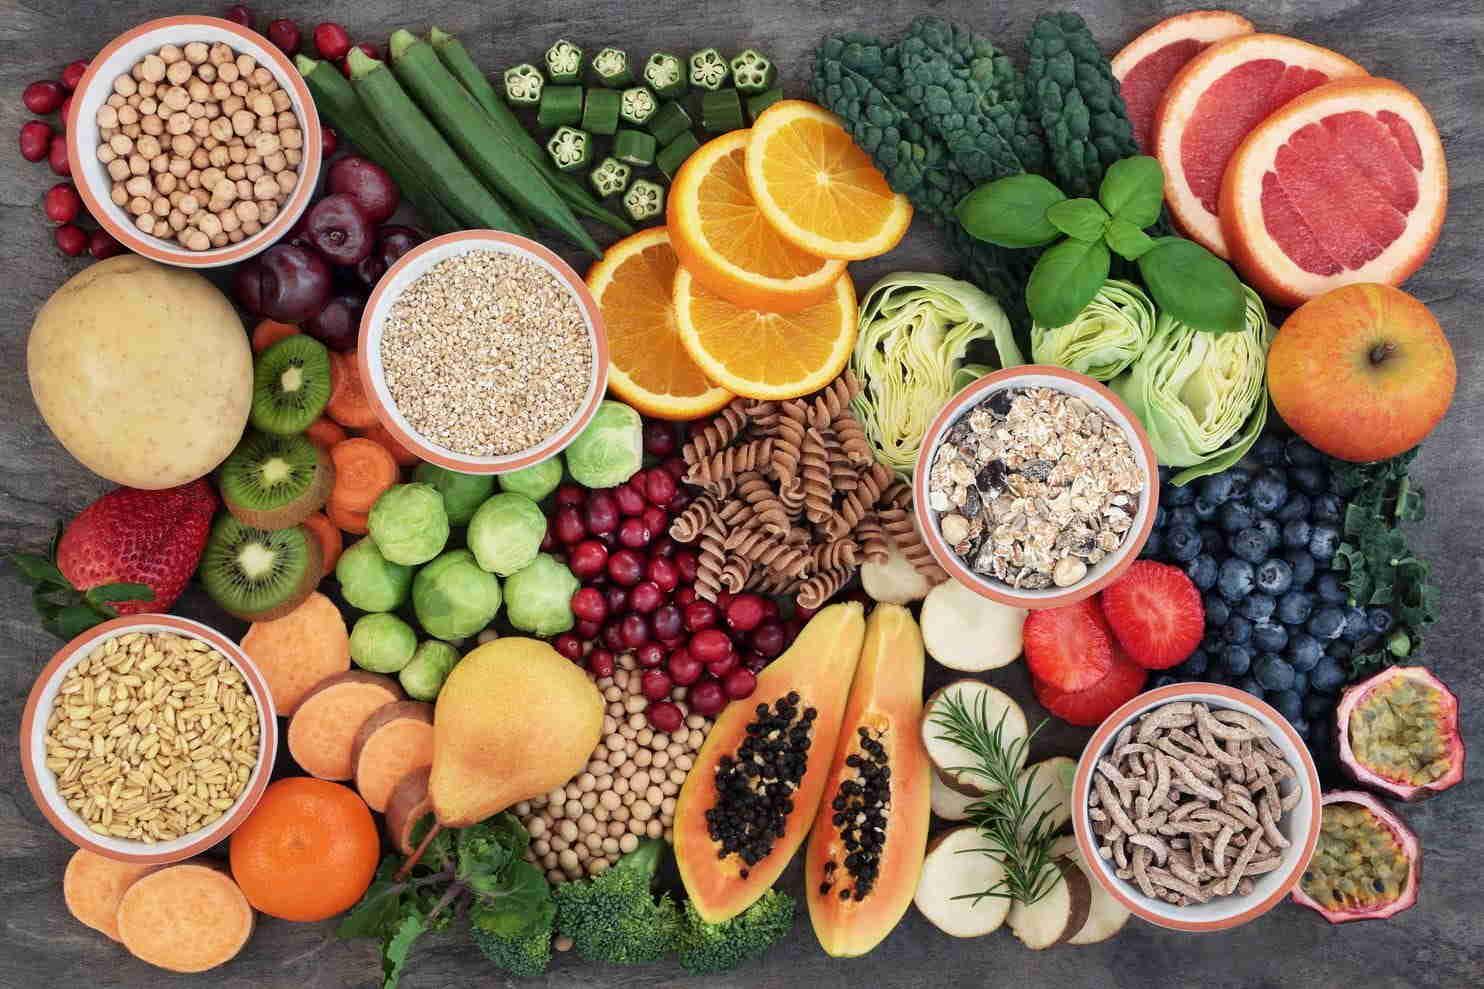 Диета Питание Фруктами. Фруктовая диета: минус 10 кг за 7 дней